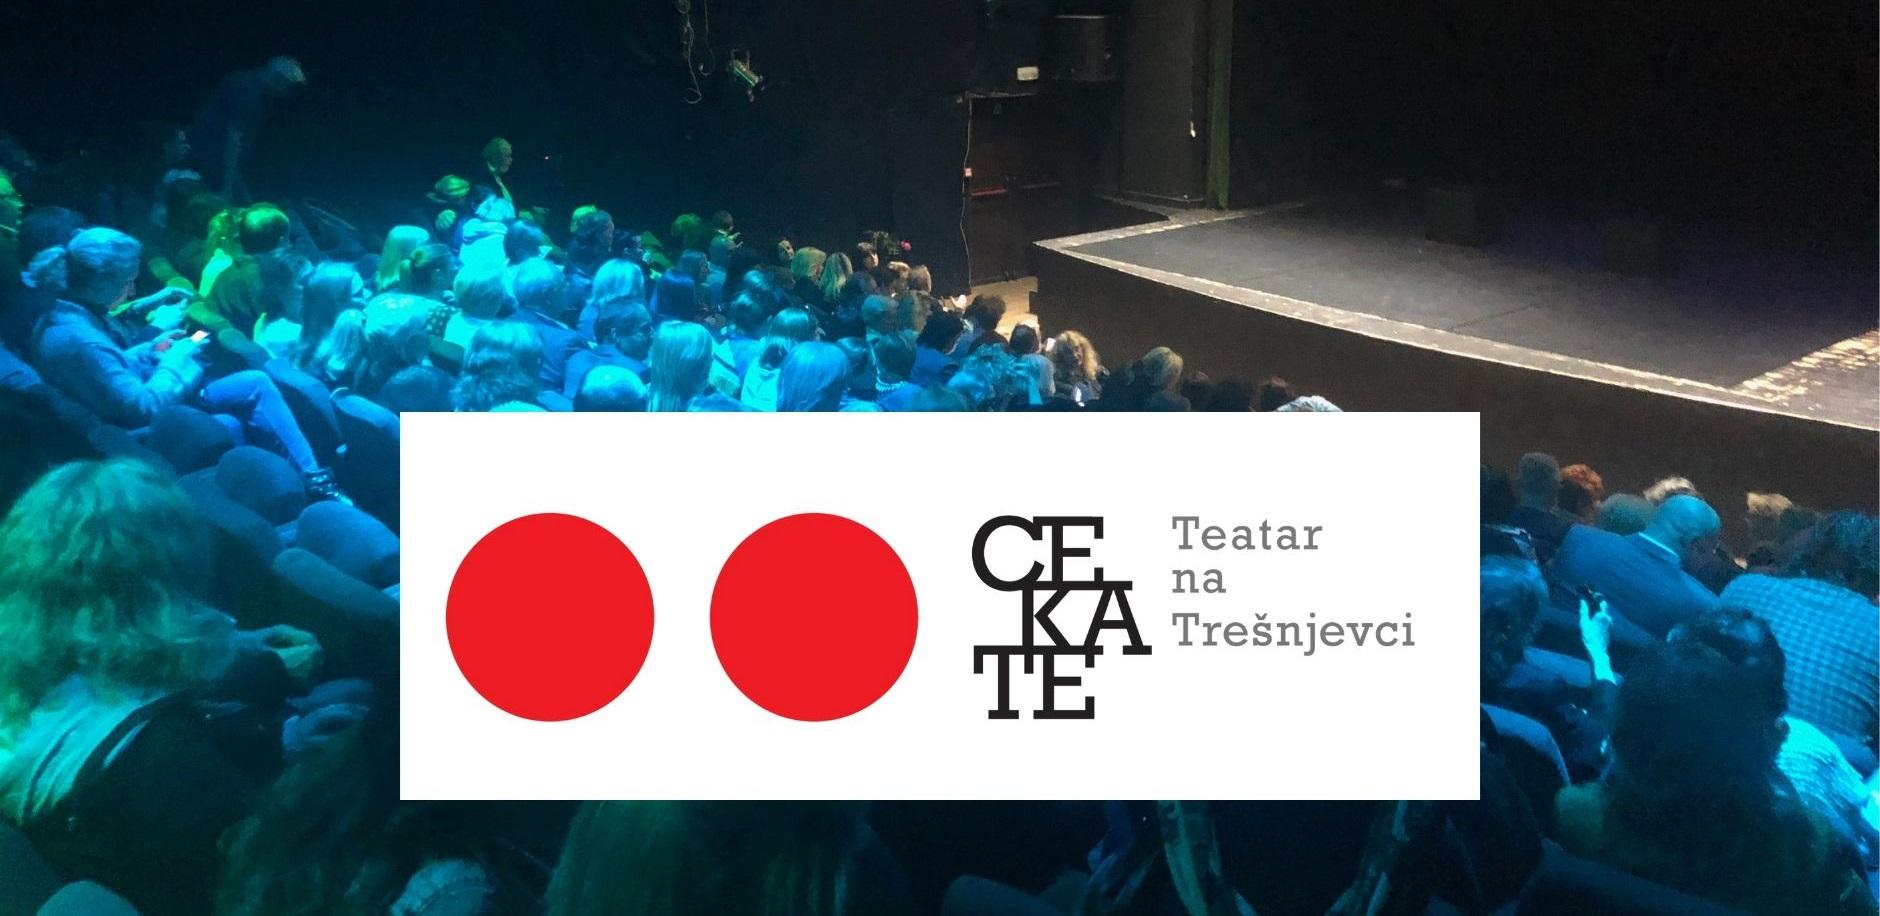 CeKaTe Teatar – rujan do studeni 2019.